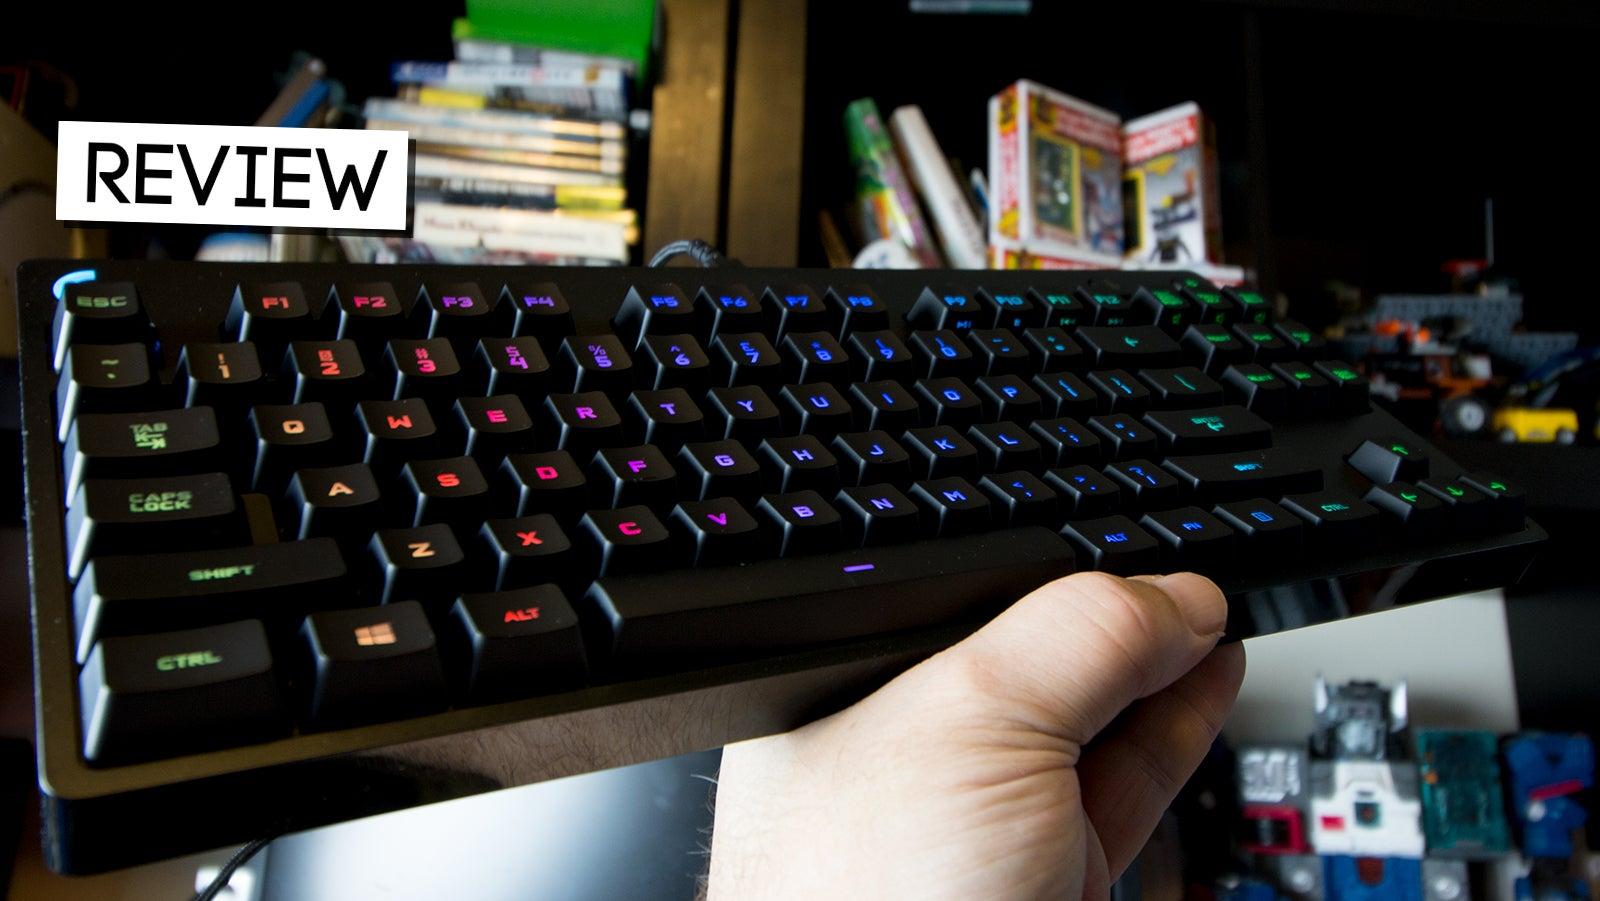 Logitech G Pro Gaming Keyboard Review: Professional Grade